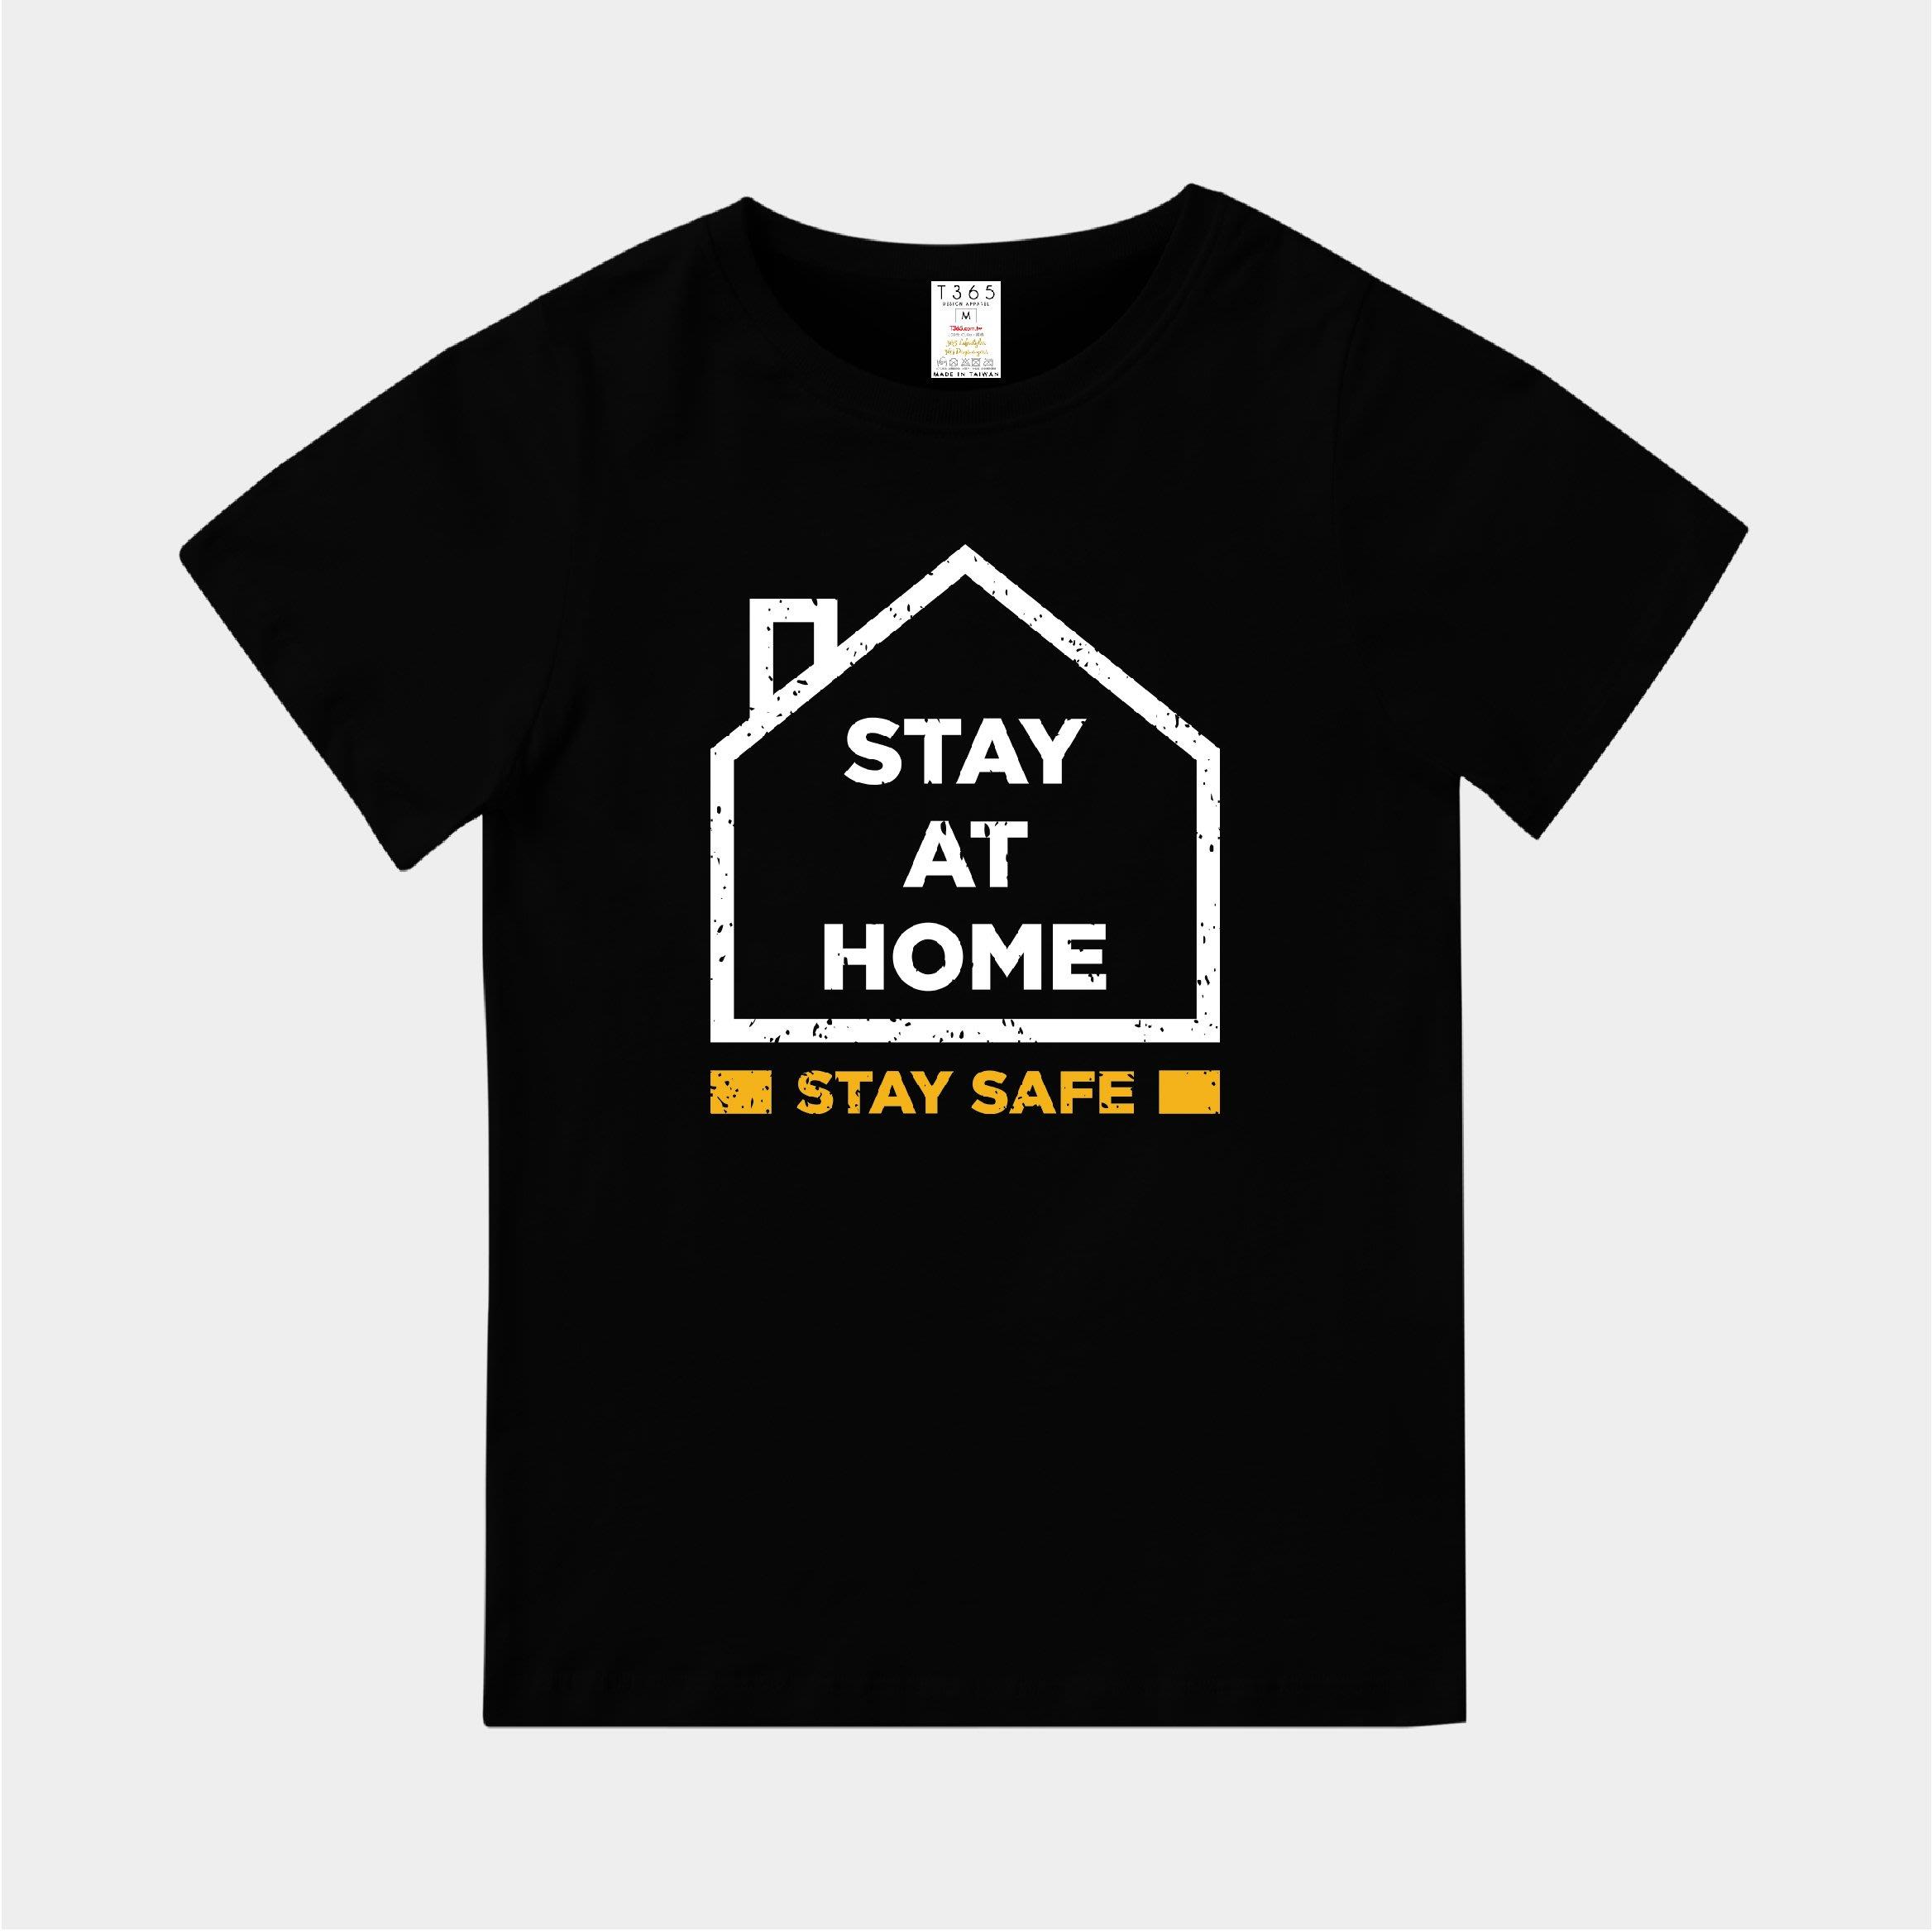 T365 台灣製造 MIT CORONAVIRUS COVID-19 STAY HOME 線條 親子裝 童裝 T恤 T